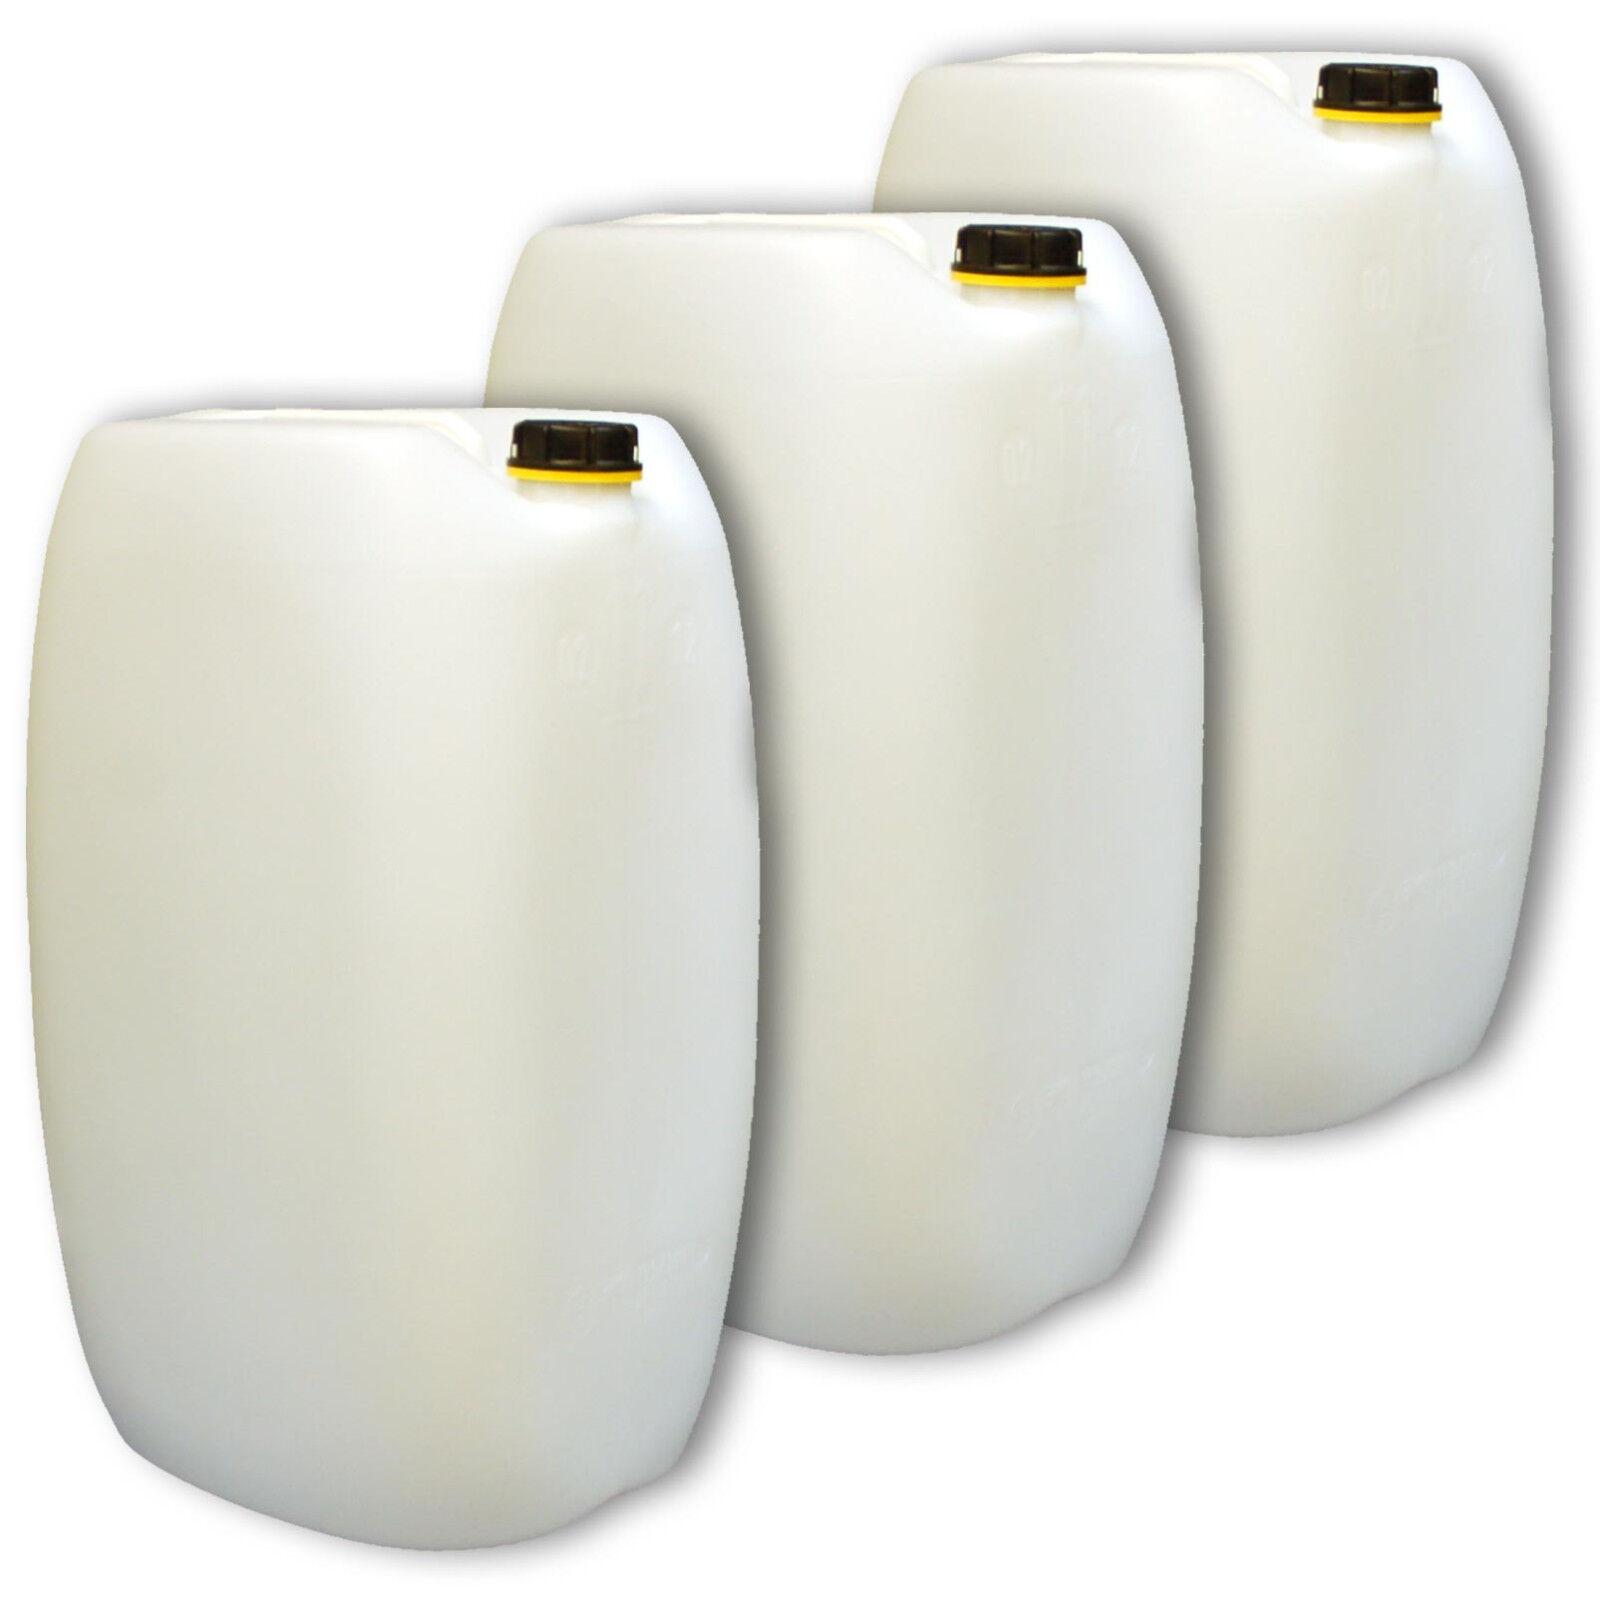 3 Stück 60 Liter Behälter Kanister Wasserkanister Farbe natur weiß 1Griff DIN61